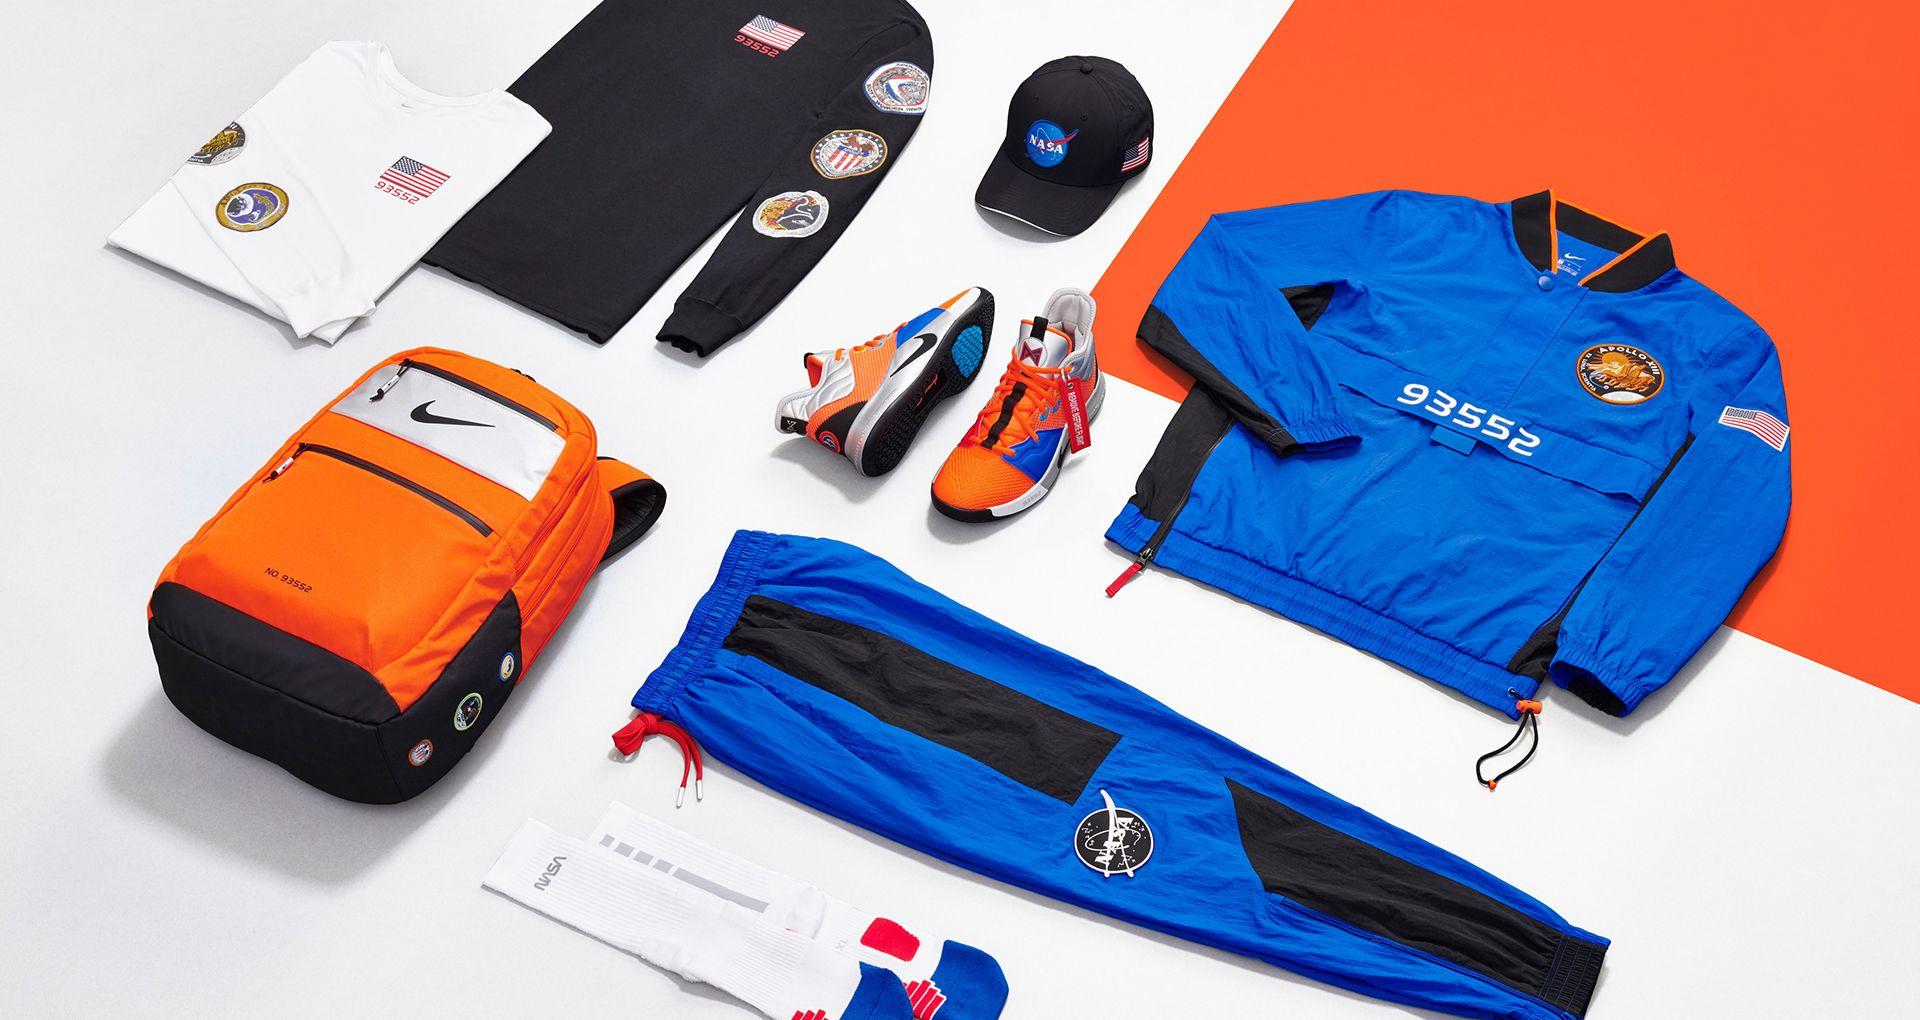 Erfahre mehr über das Design: PG3 X NASA. Nike SNEAKRS DE